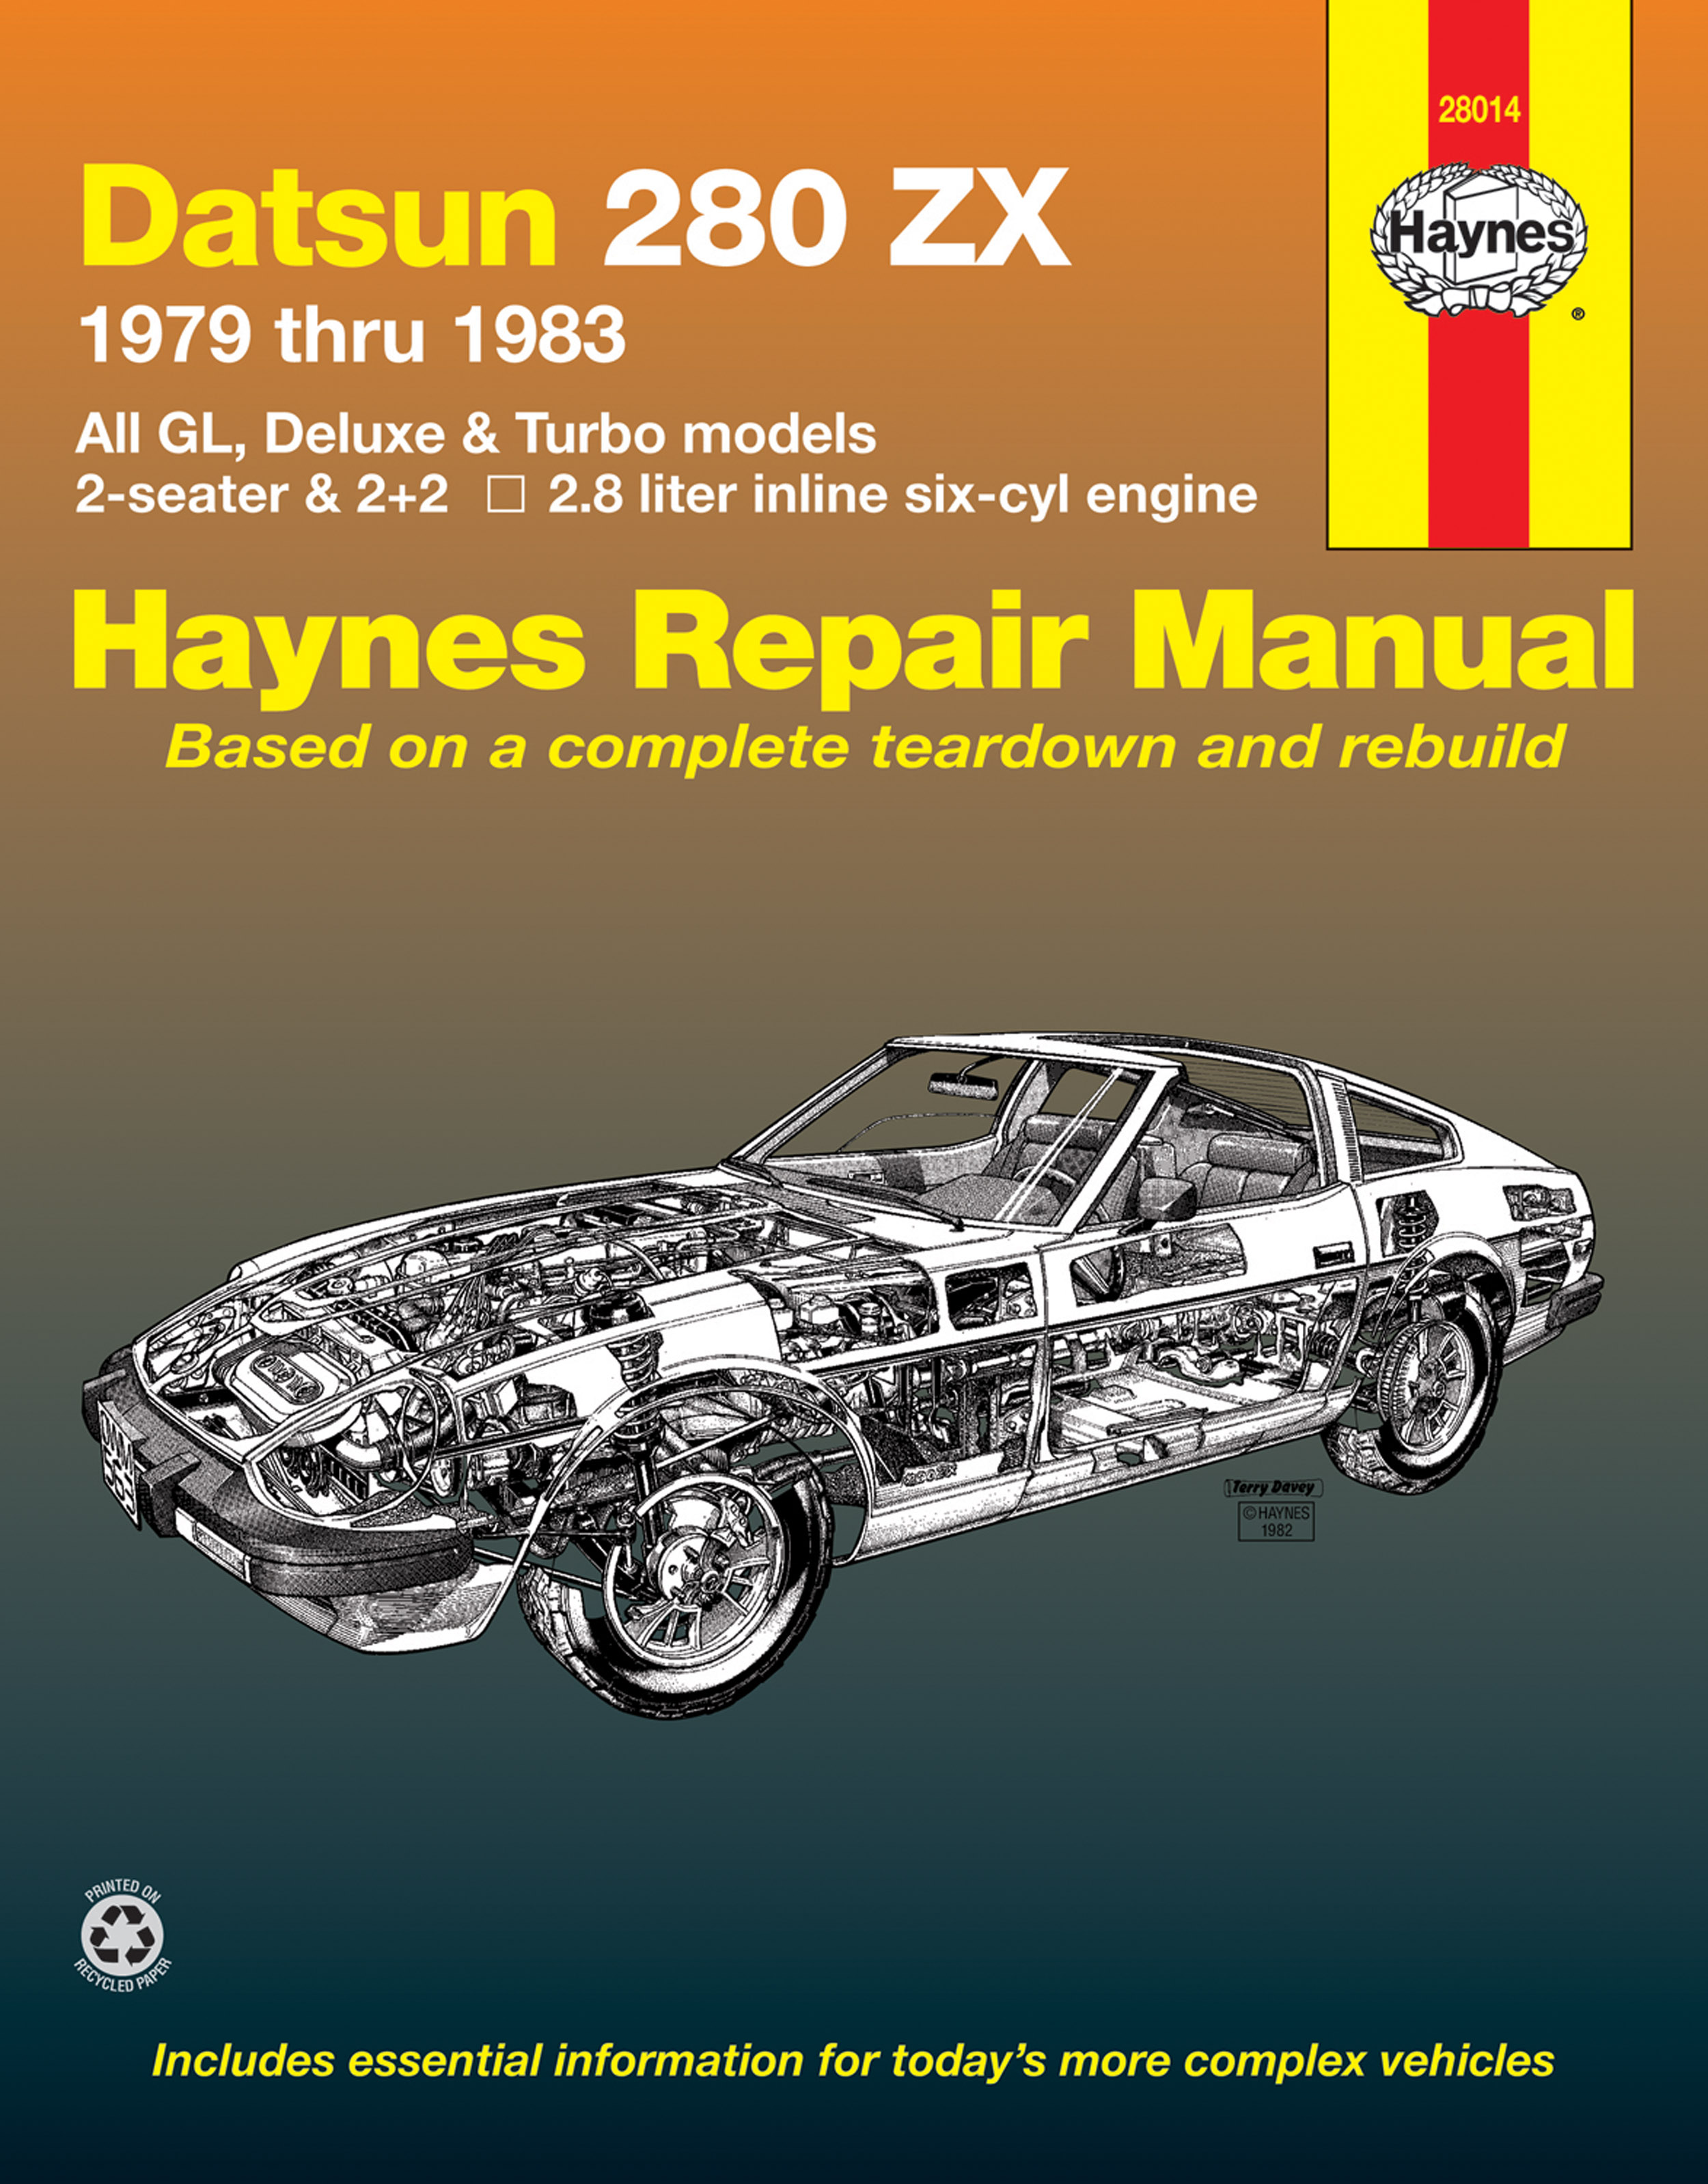 Datsun 280ZX (79-83) Haynes Repair Manual